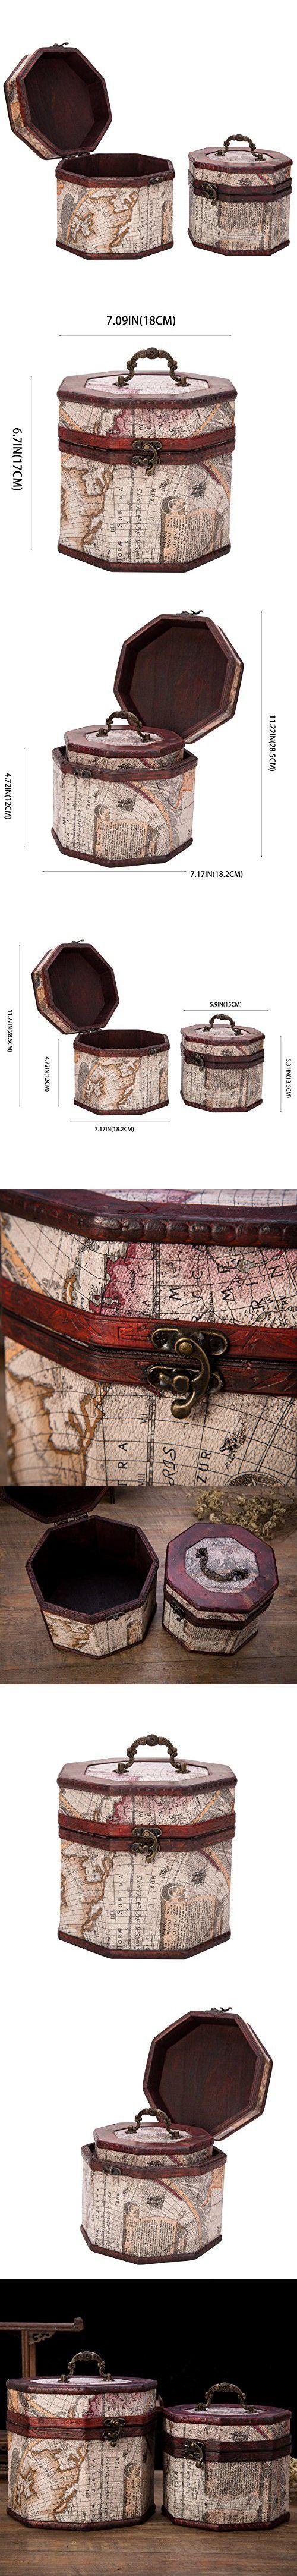 558 best decorative jewelry boxes images on pinterest jewel box vintage style world map pattern wooden octagon jewelry treasure box storage organizer trinket keepsake chest set gumiabroncs Image collections